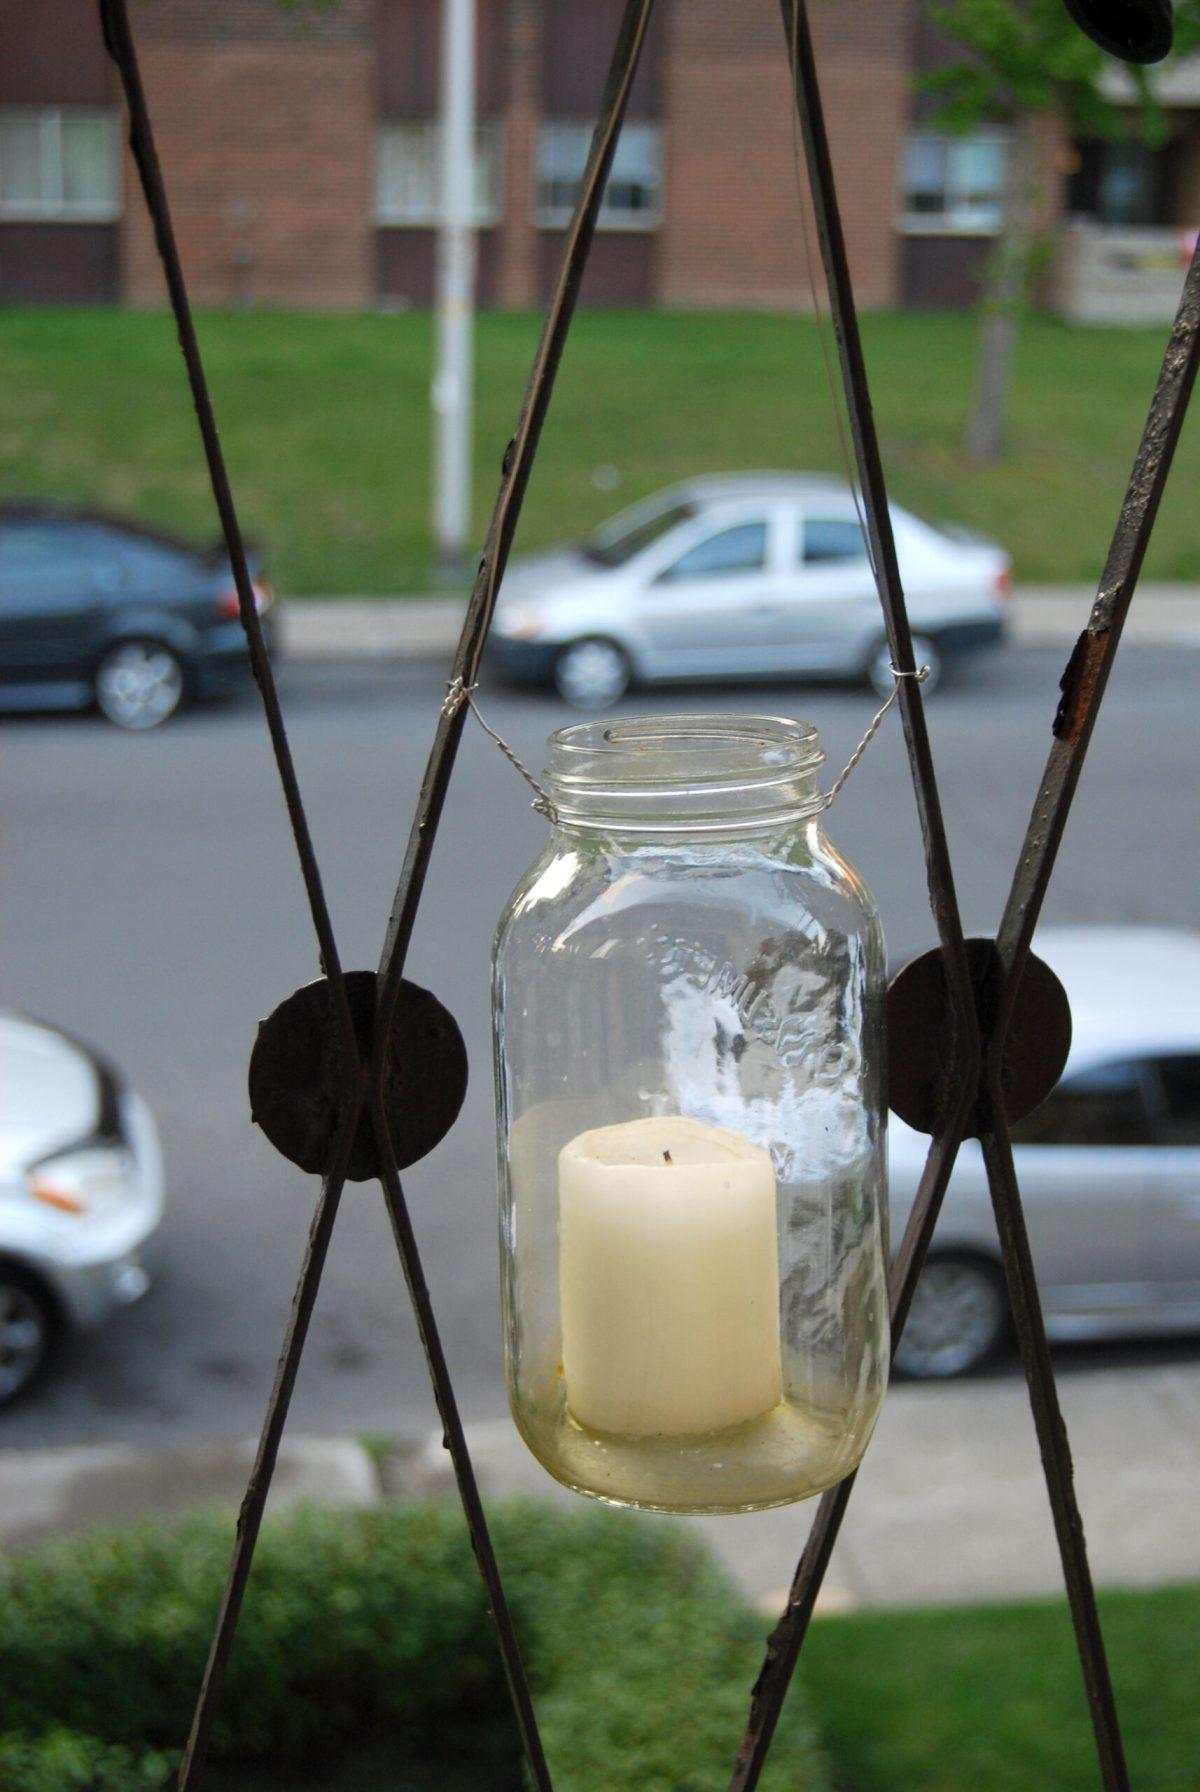 Yannick's hanging jar lantern, photo